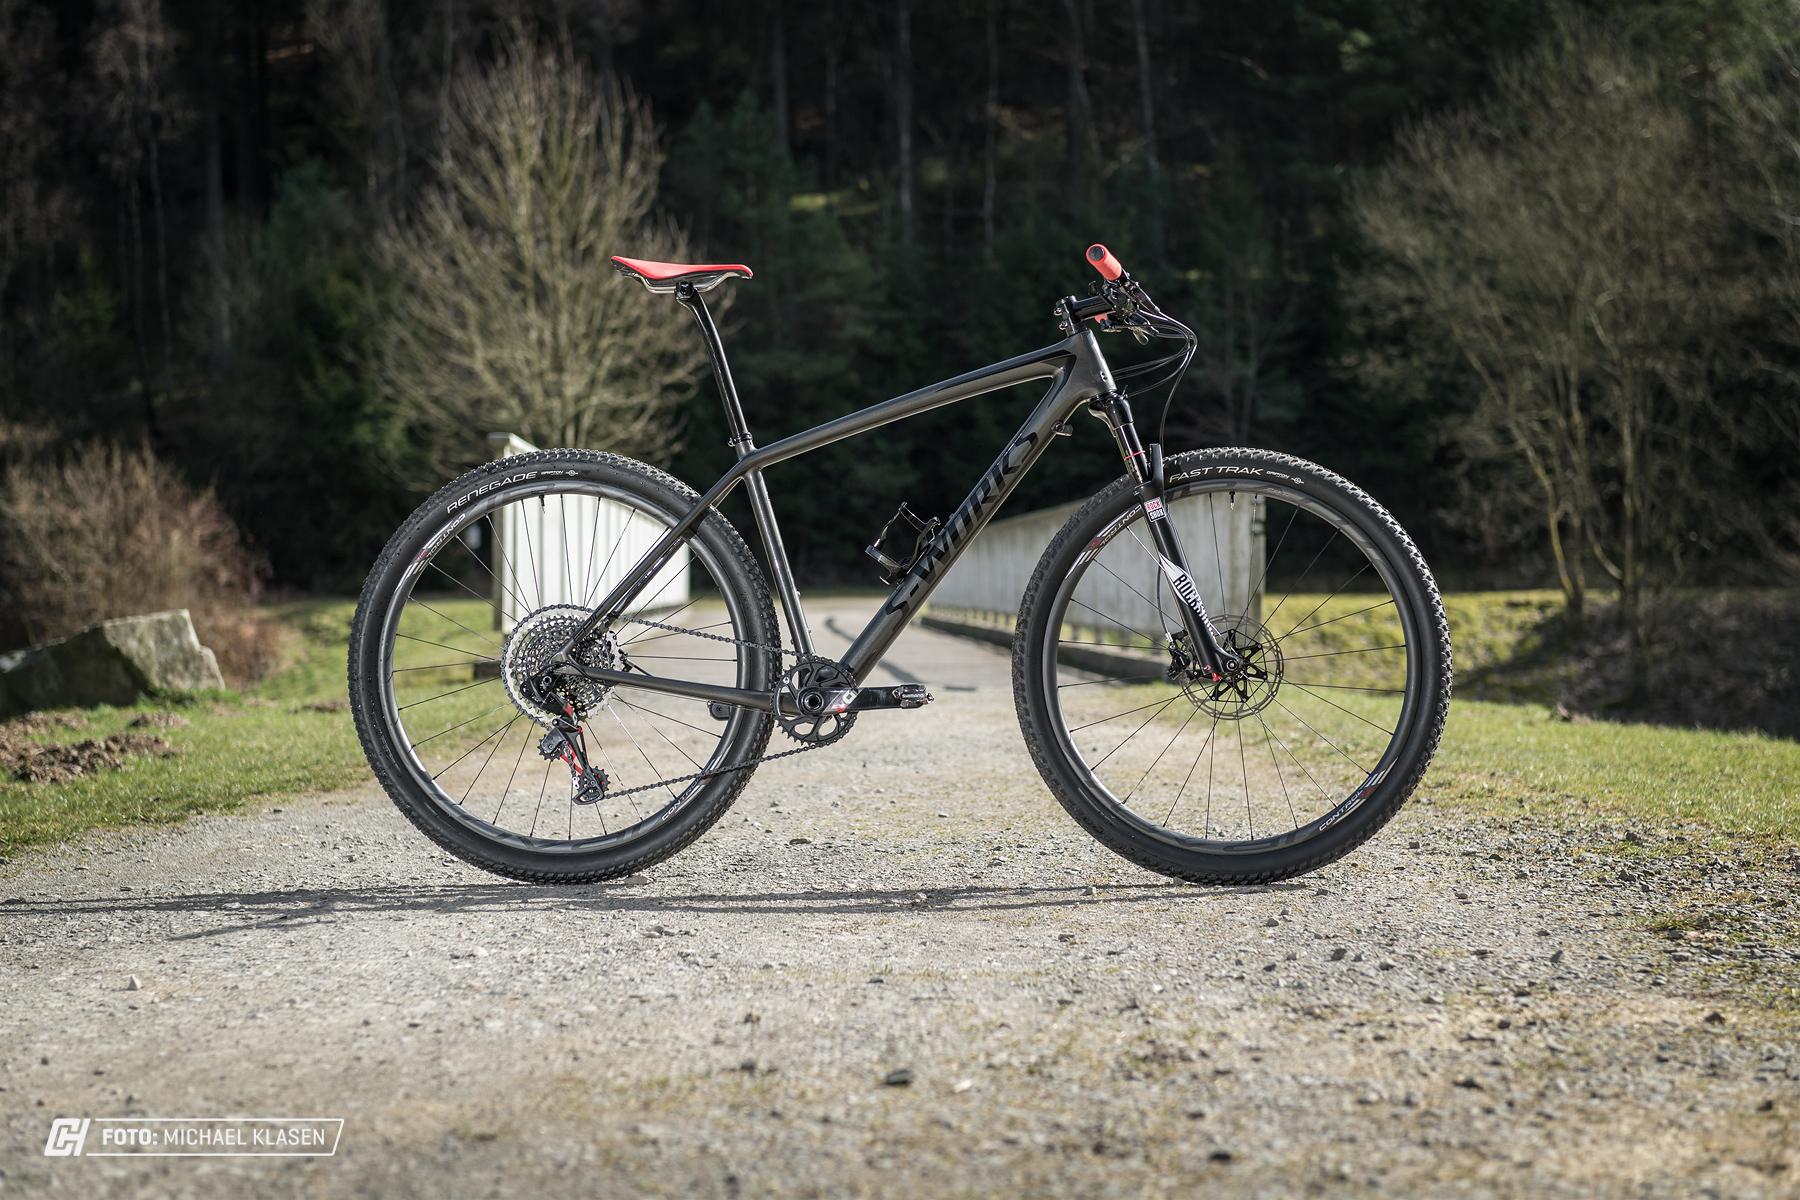 MIK 8202 Cycleholix